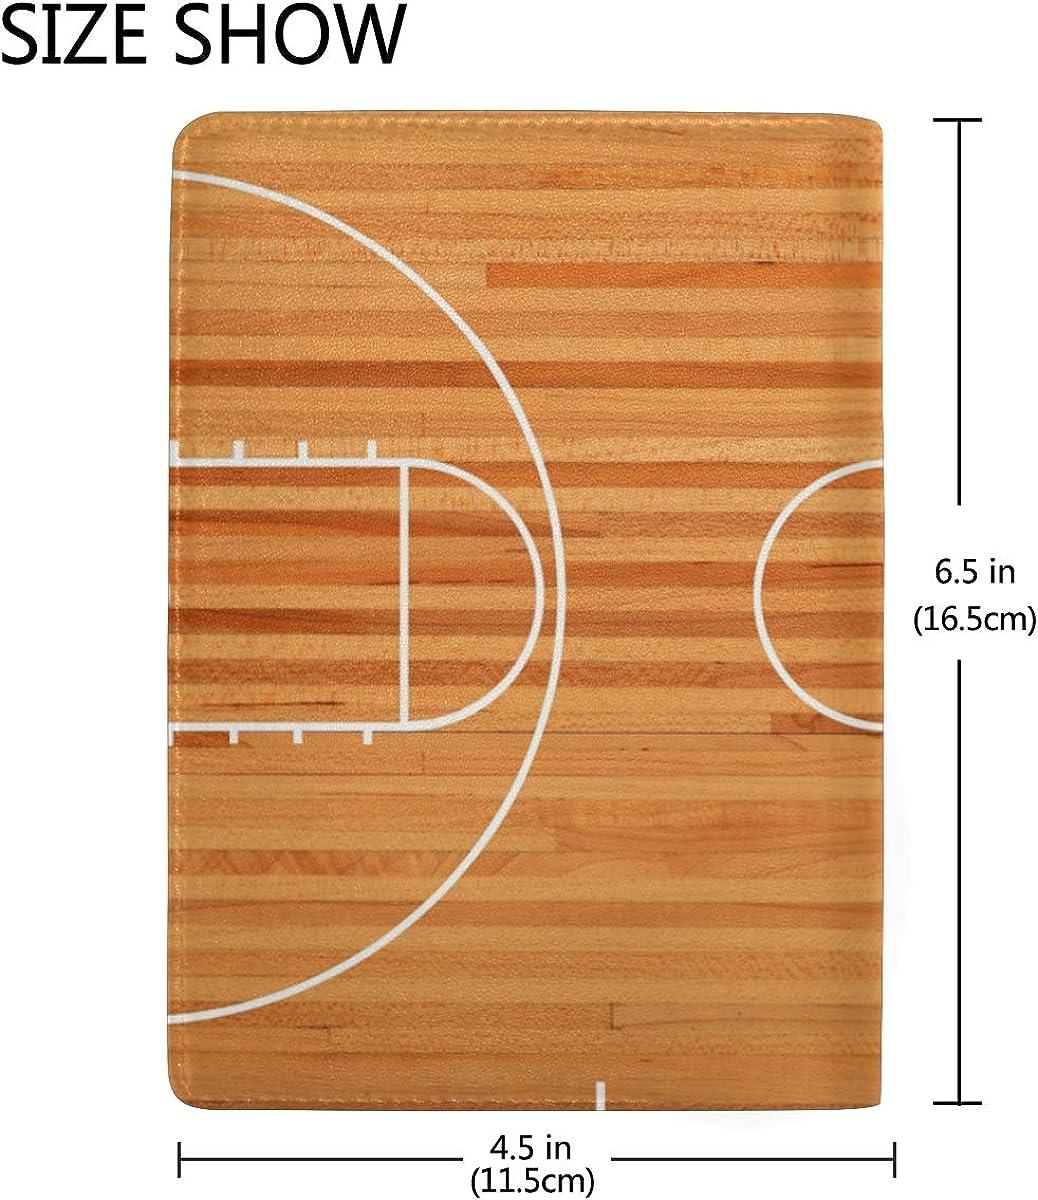 Coosun Basketball Court Floor Plan Leather Passport Holder Cover Case For Travel One Pocket Accessories Travel Accessories Clinicadelpieaitanalopez Com